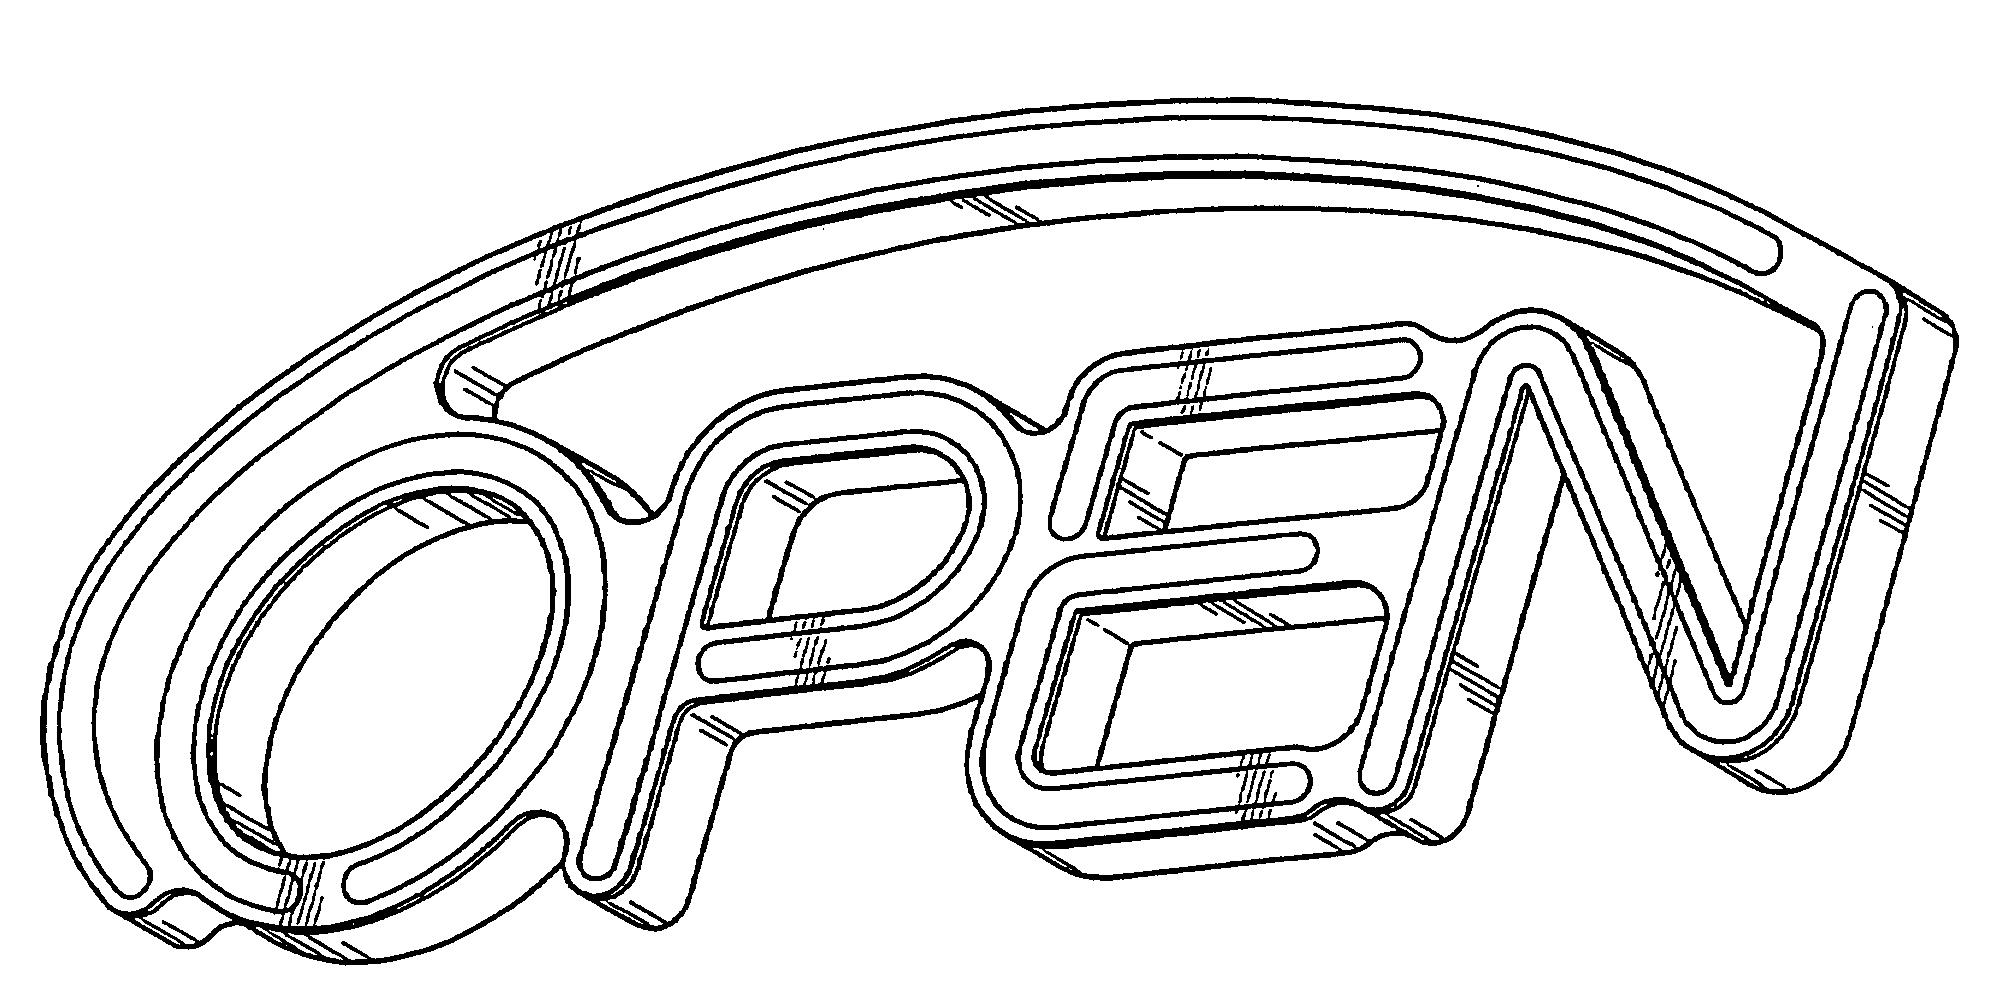 2009x1000 Patent Usd553691